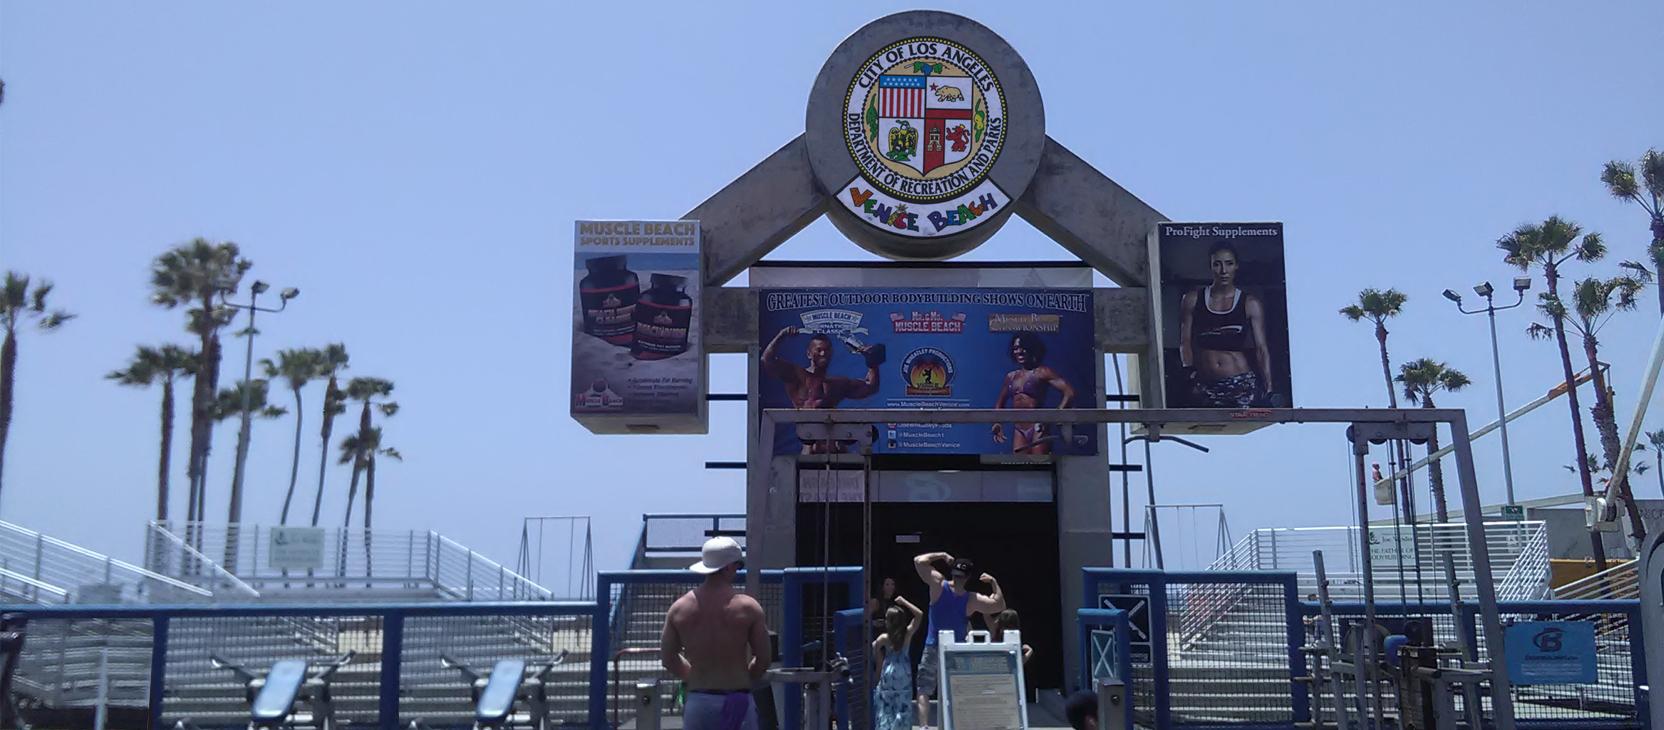 Muscle Beach Venice Ou...